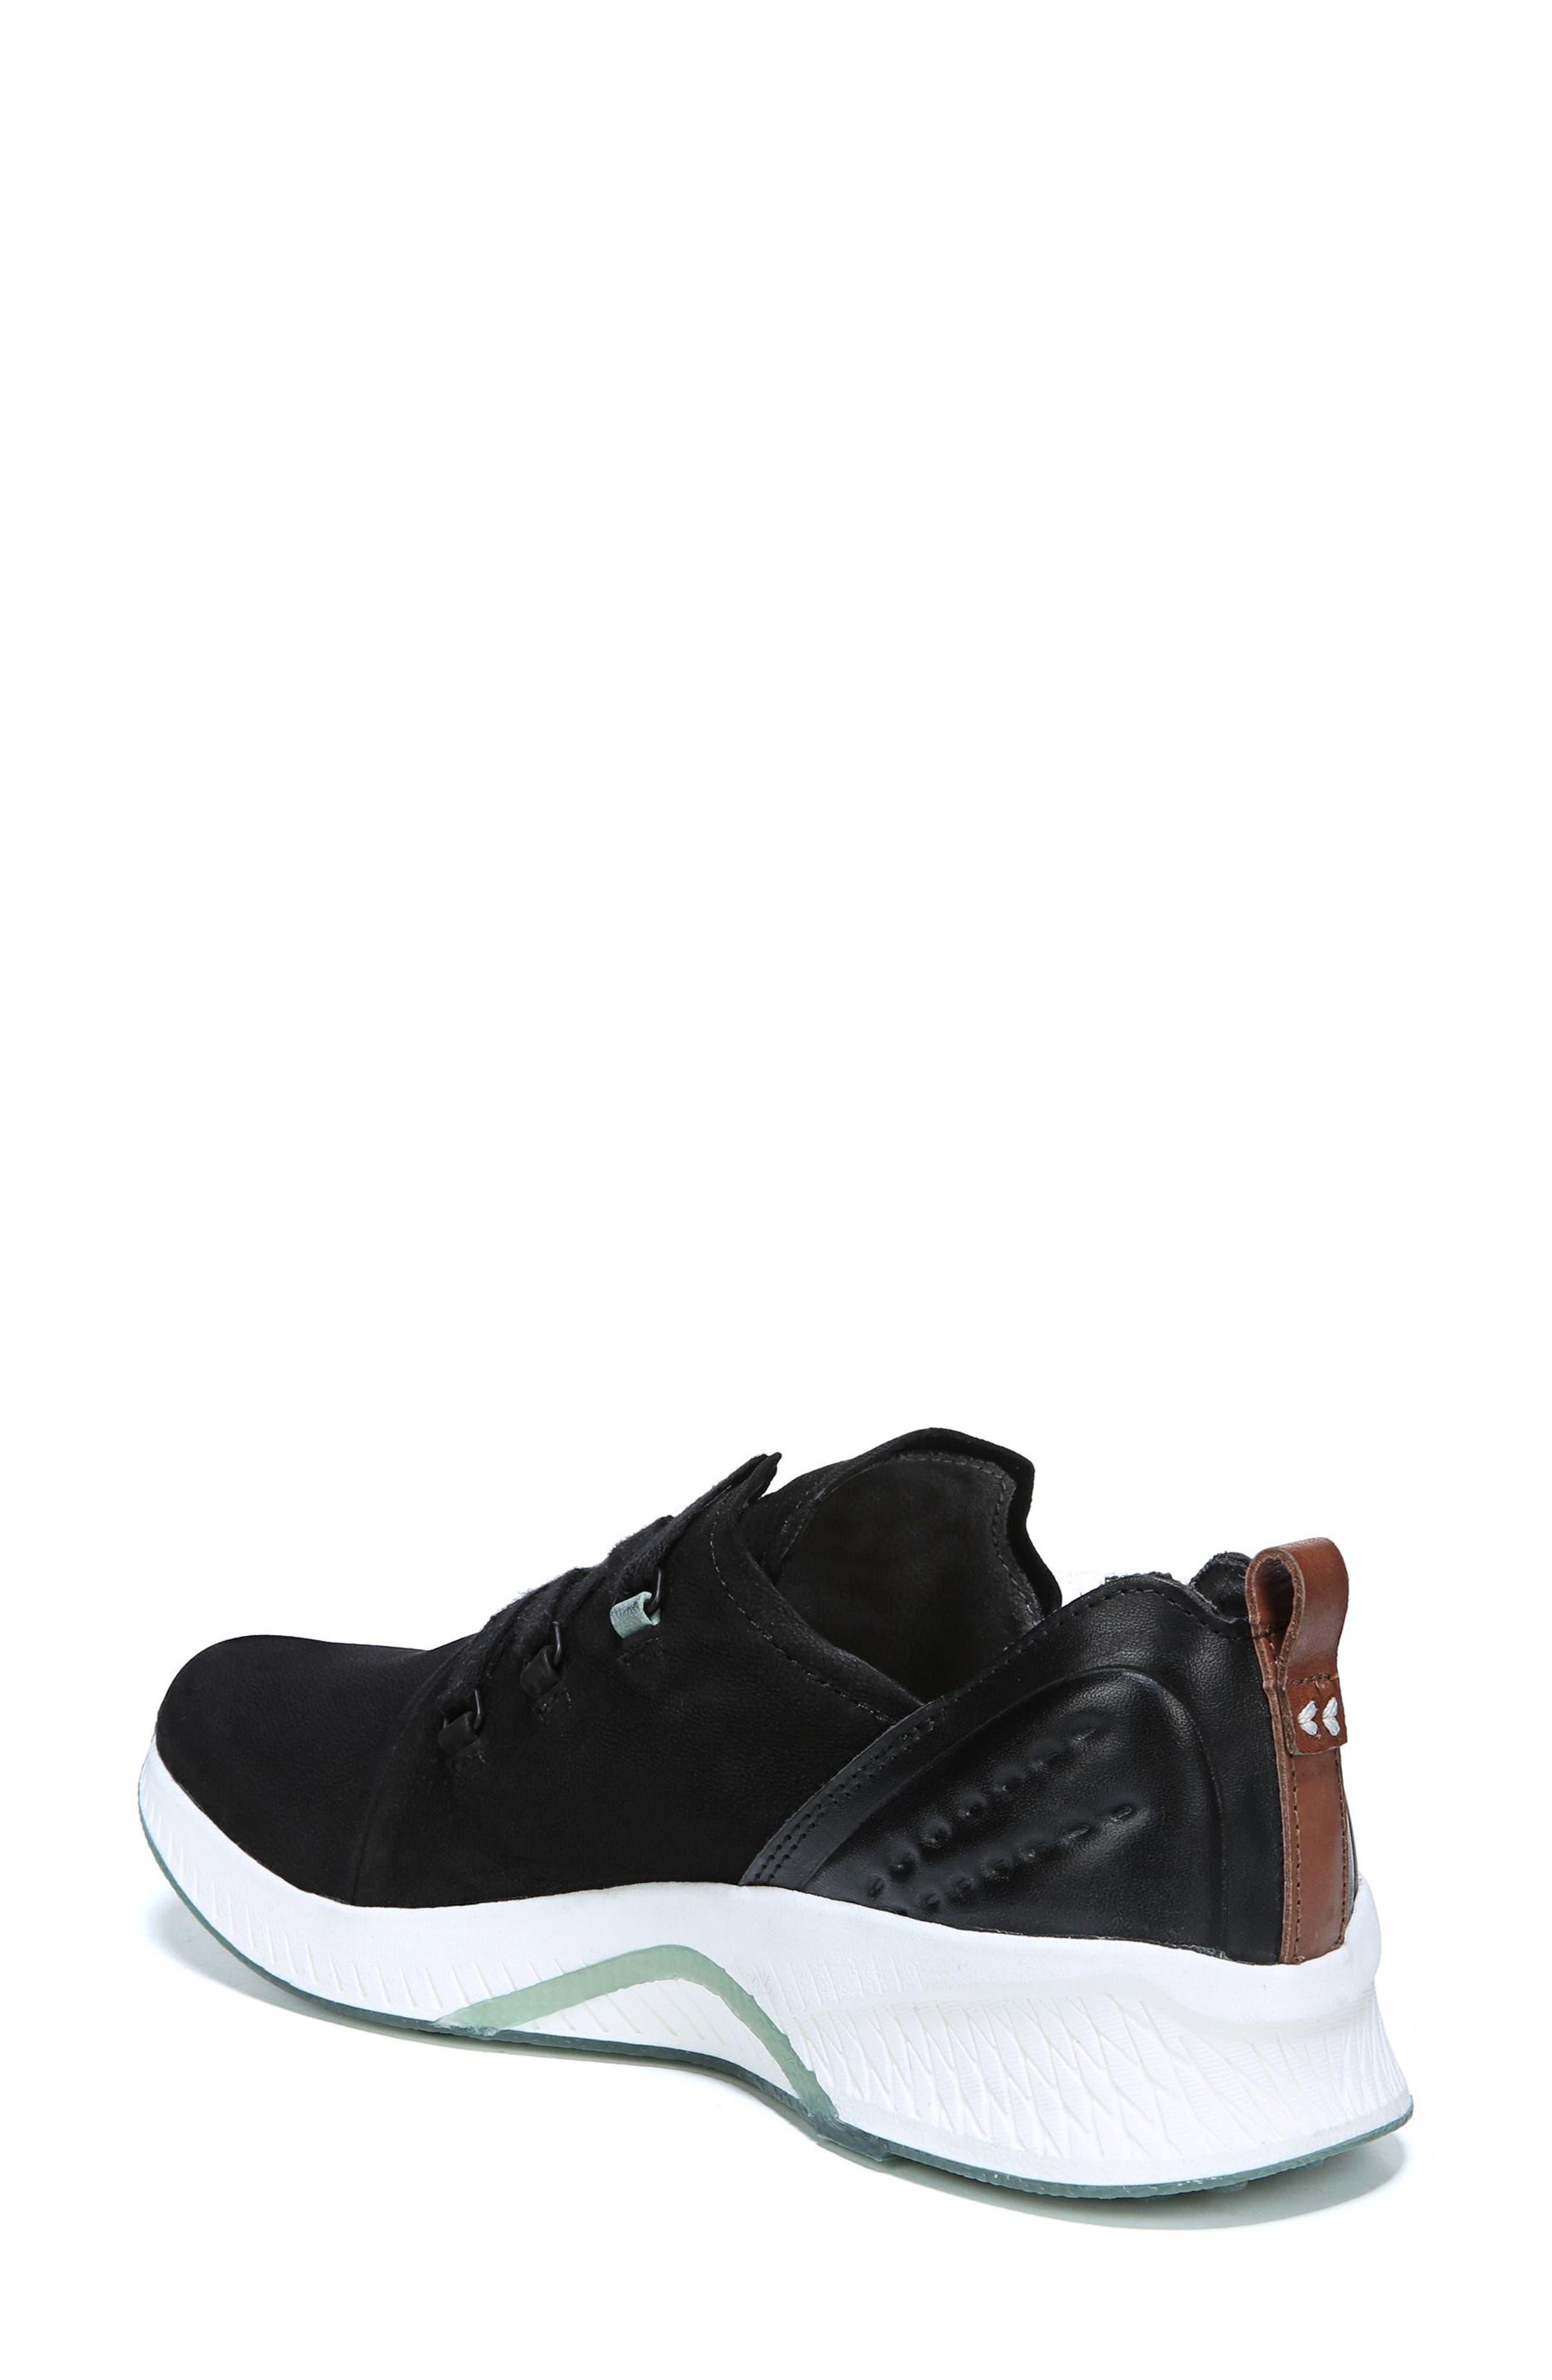 Roma Sneaker,                             Alternate thumbnail 2, color,                             001